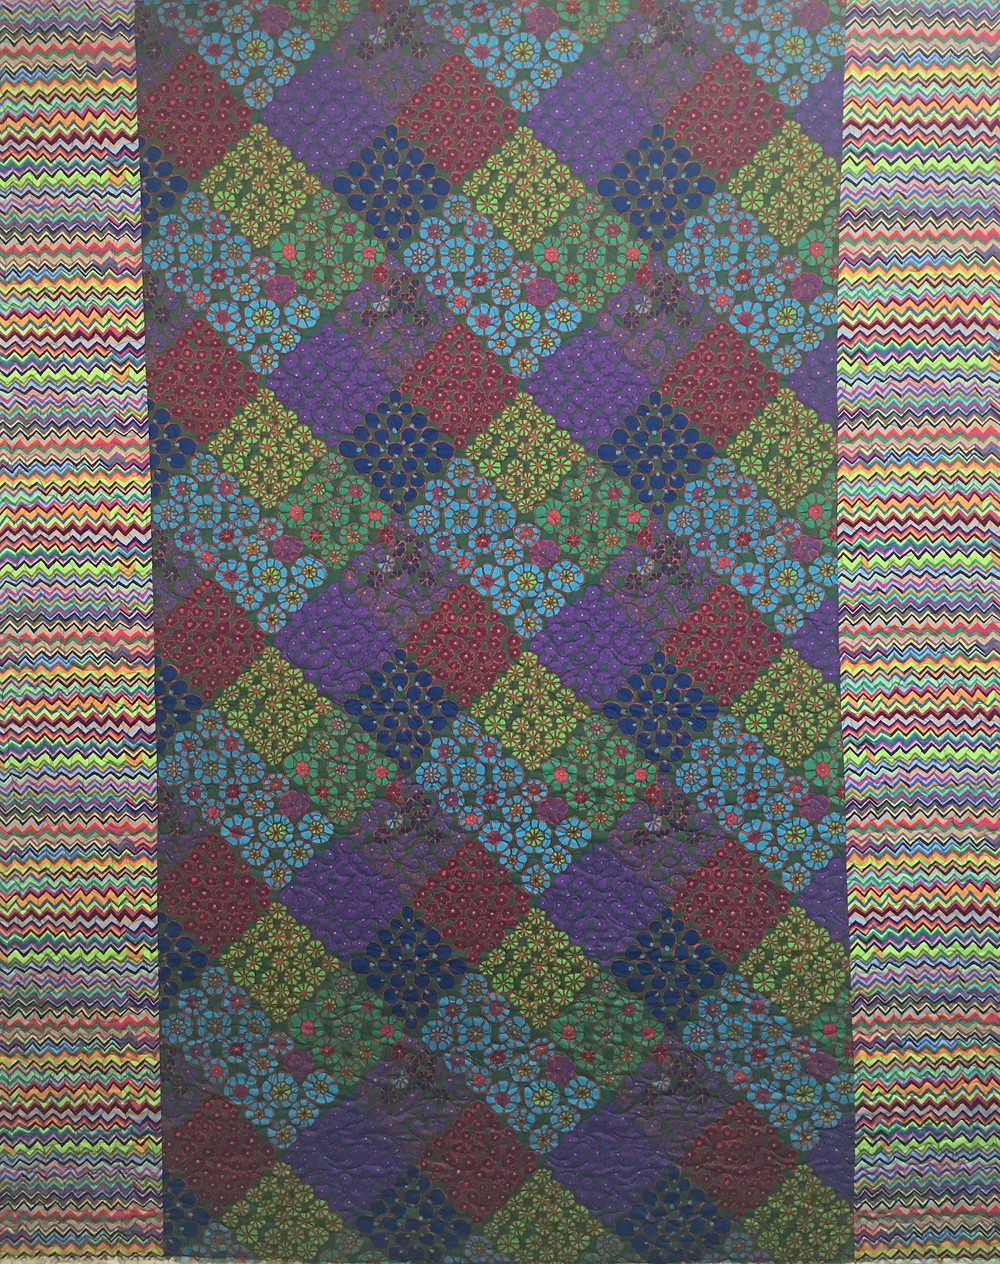 Delfina Daughter's Colorful Panel Quilt